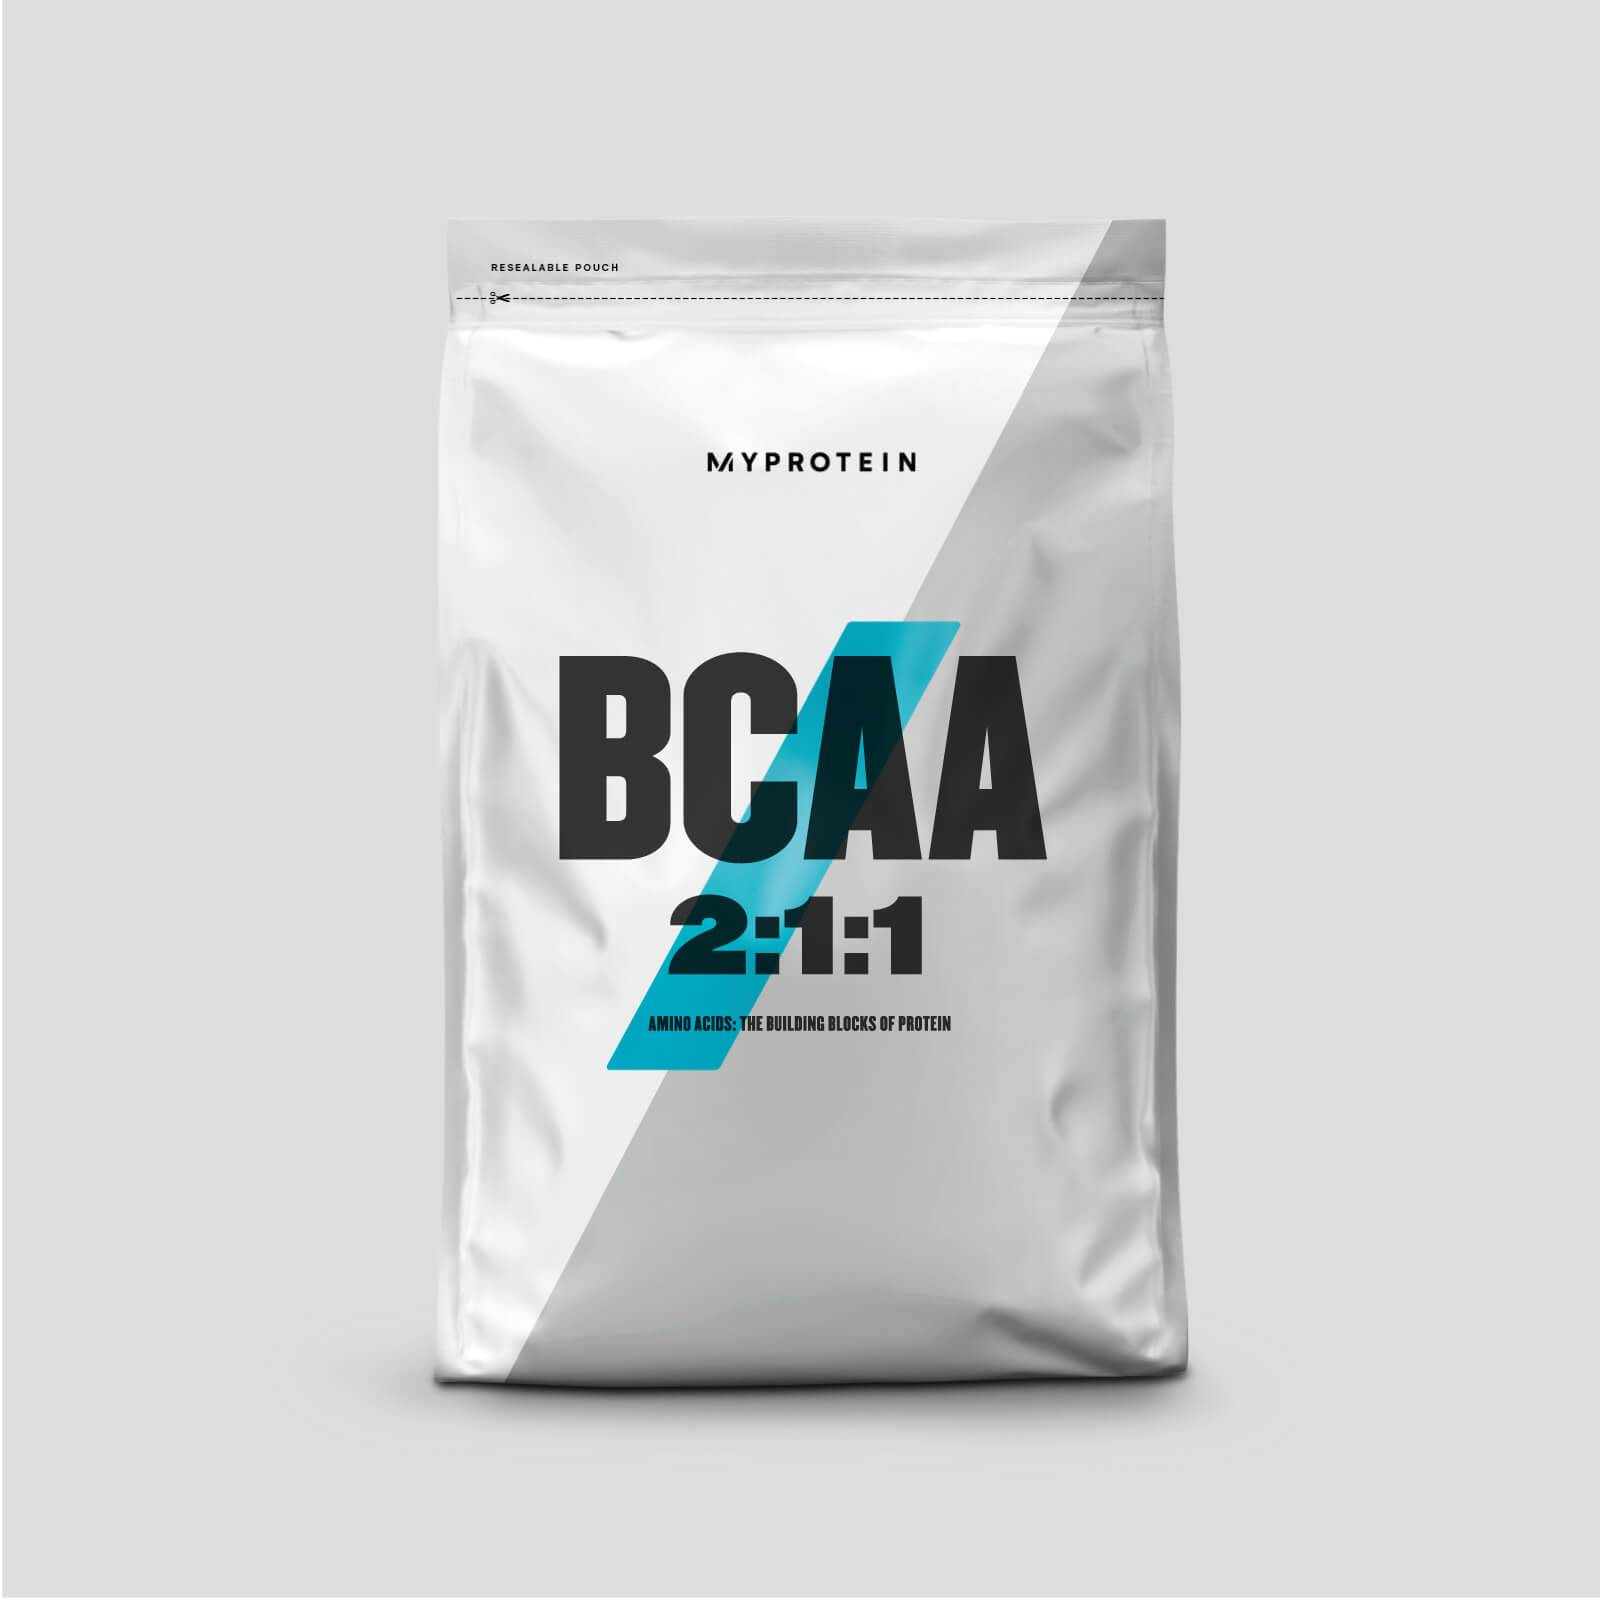 Myprotein BCAA - 250g - Bitter Lemon